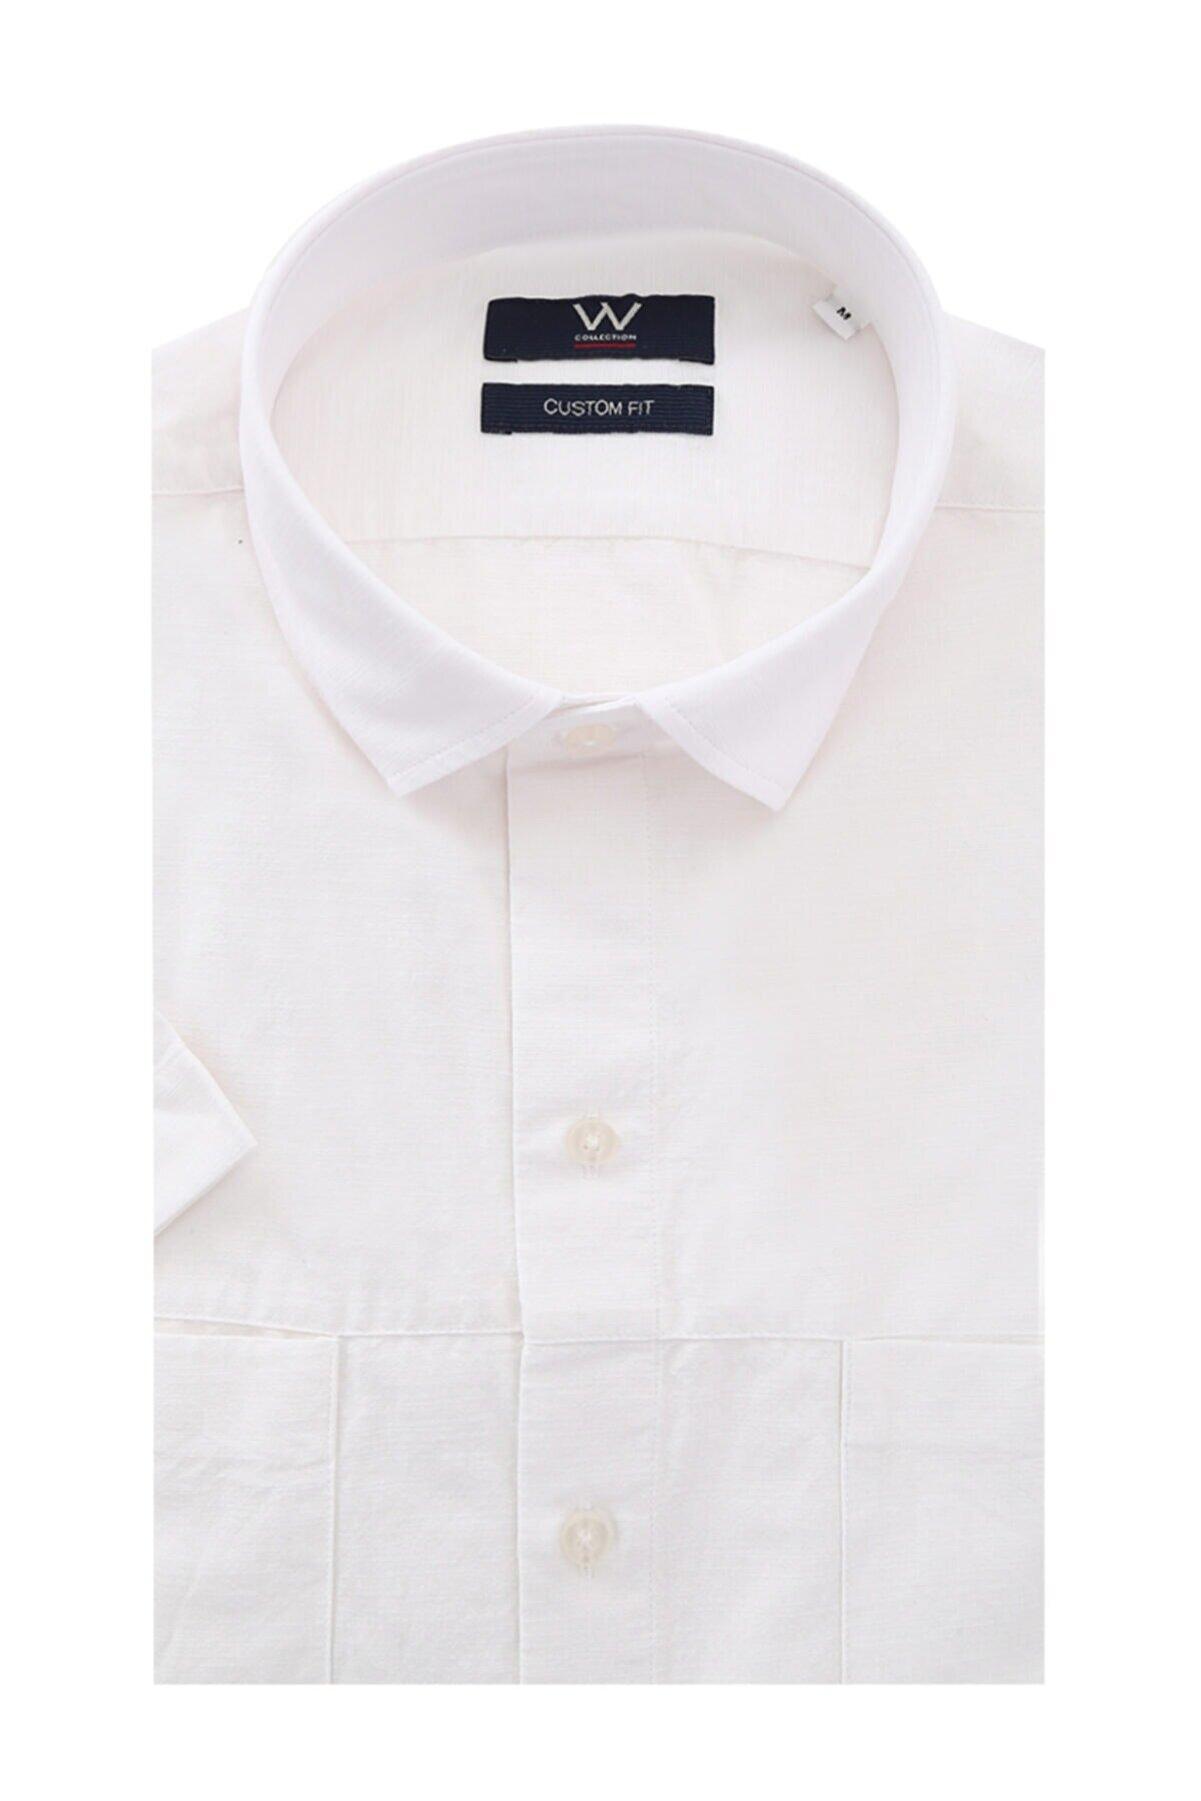 W Collection Beyaz Cepli Gömlek